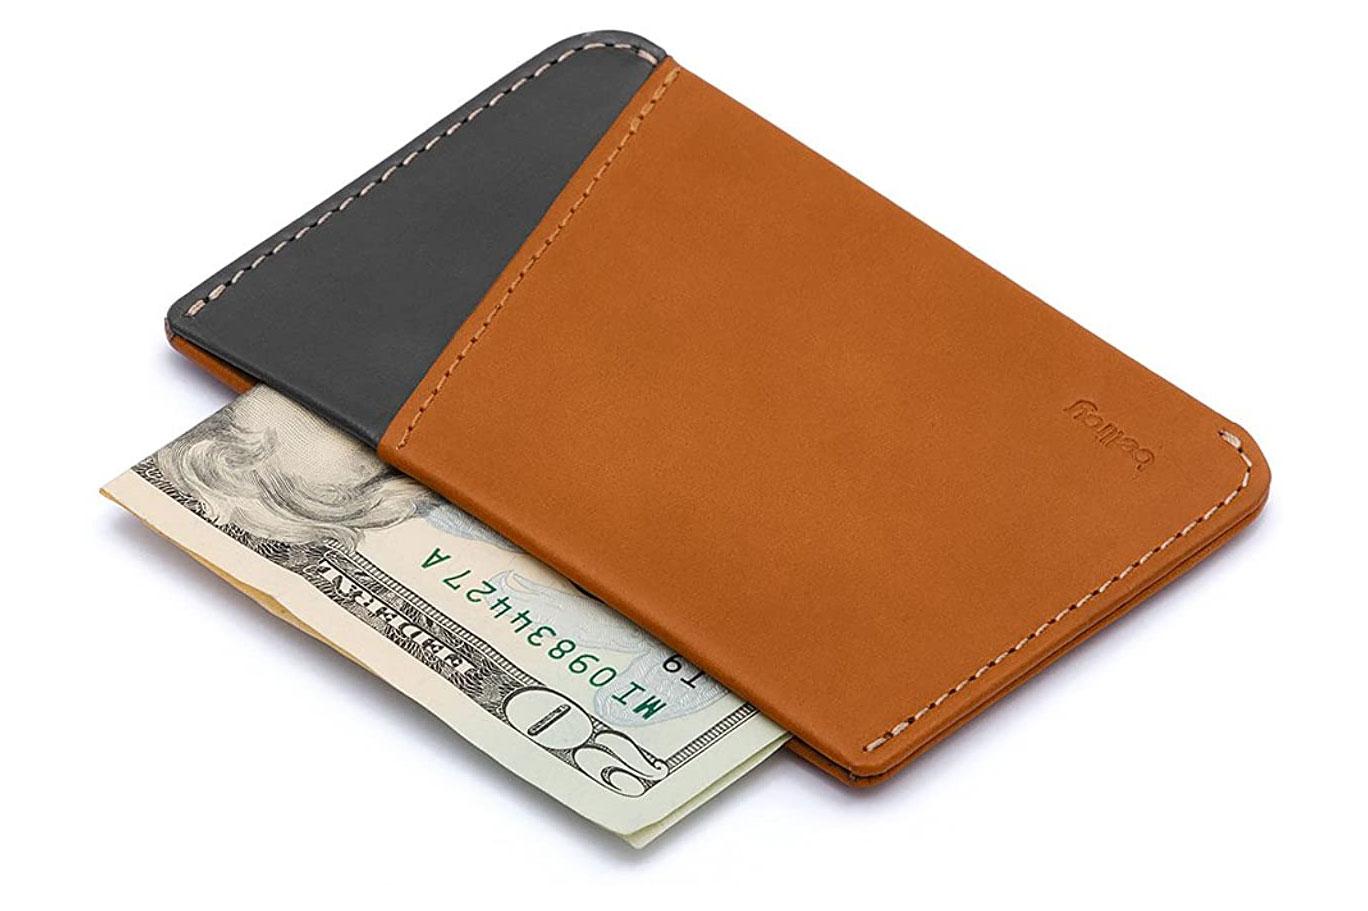 bellroy micro sleeve wallet